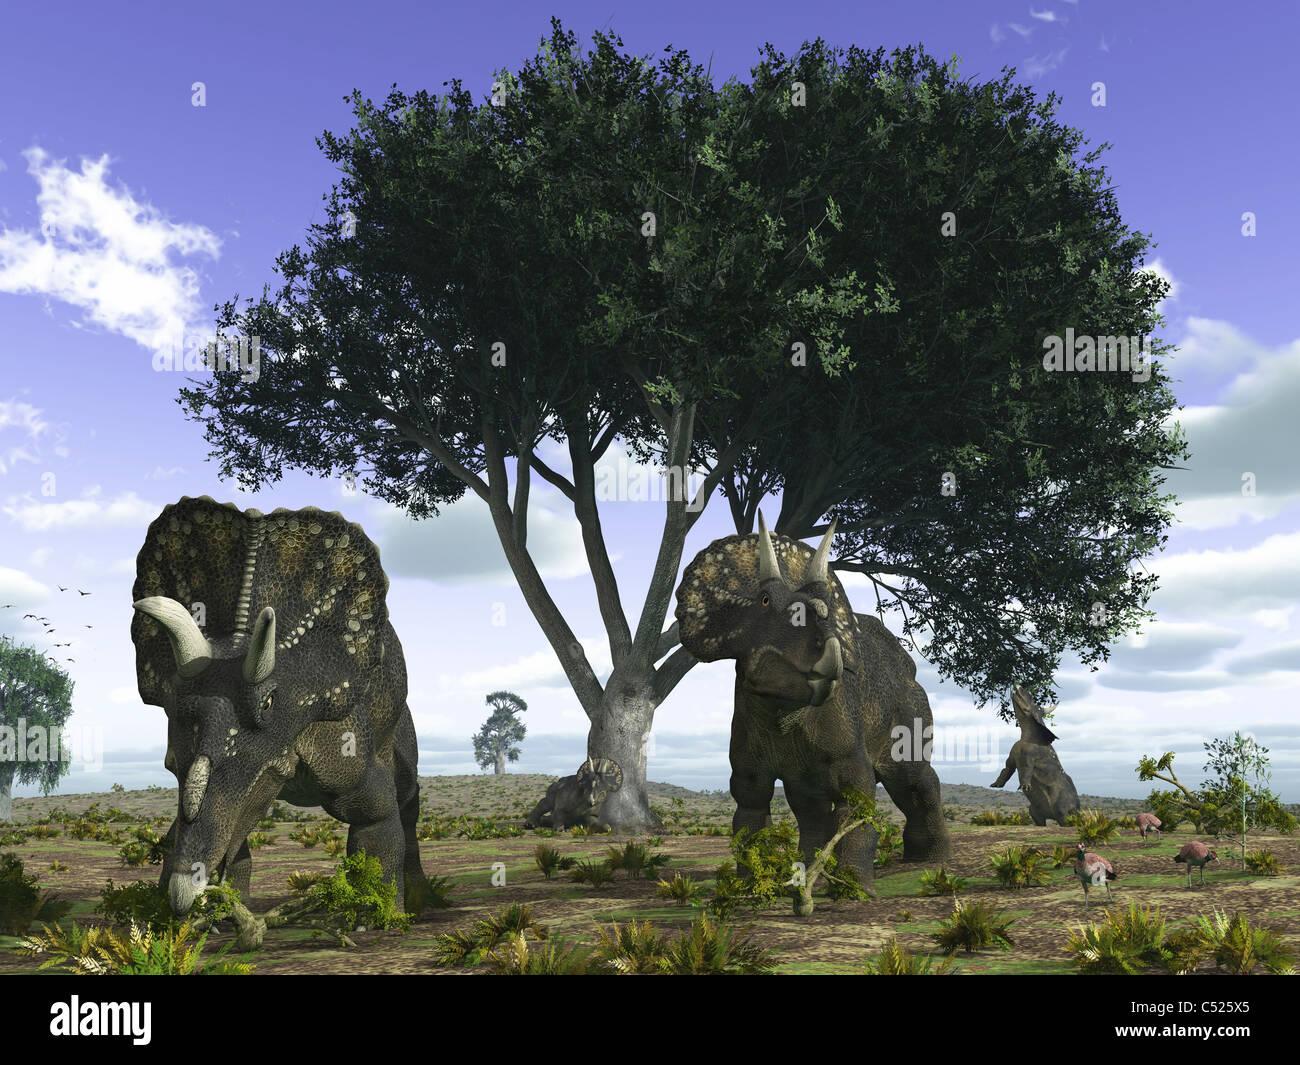 Nedoceratops graze beneath a giant Oak Tree. - Stock Image